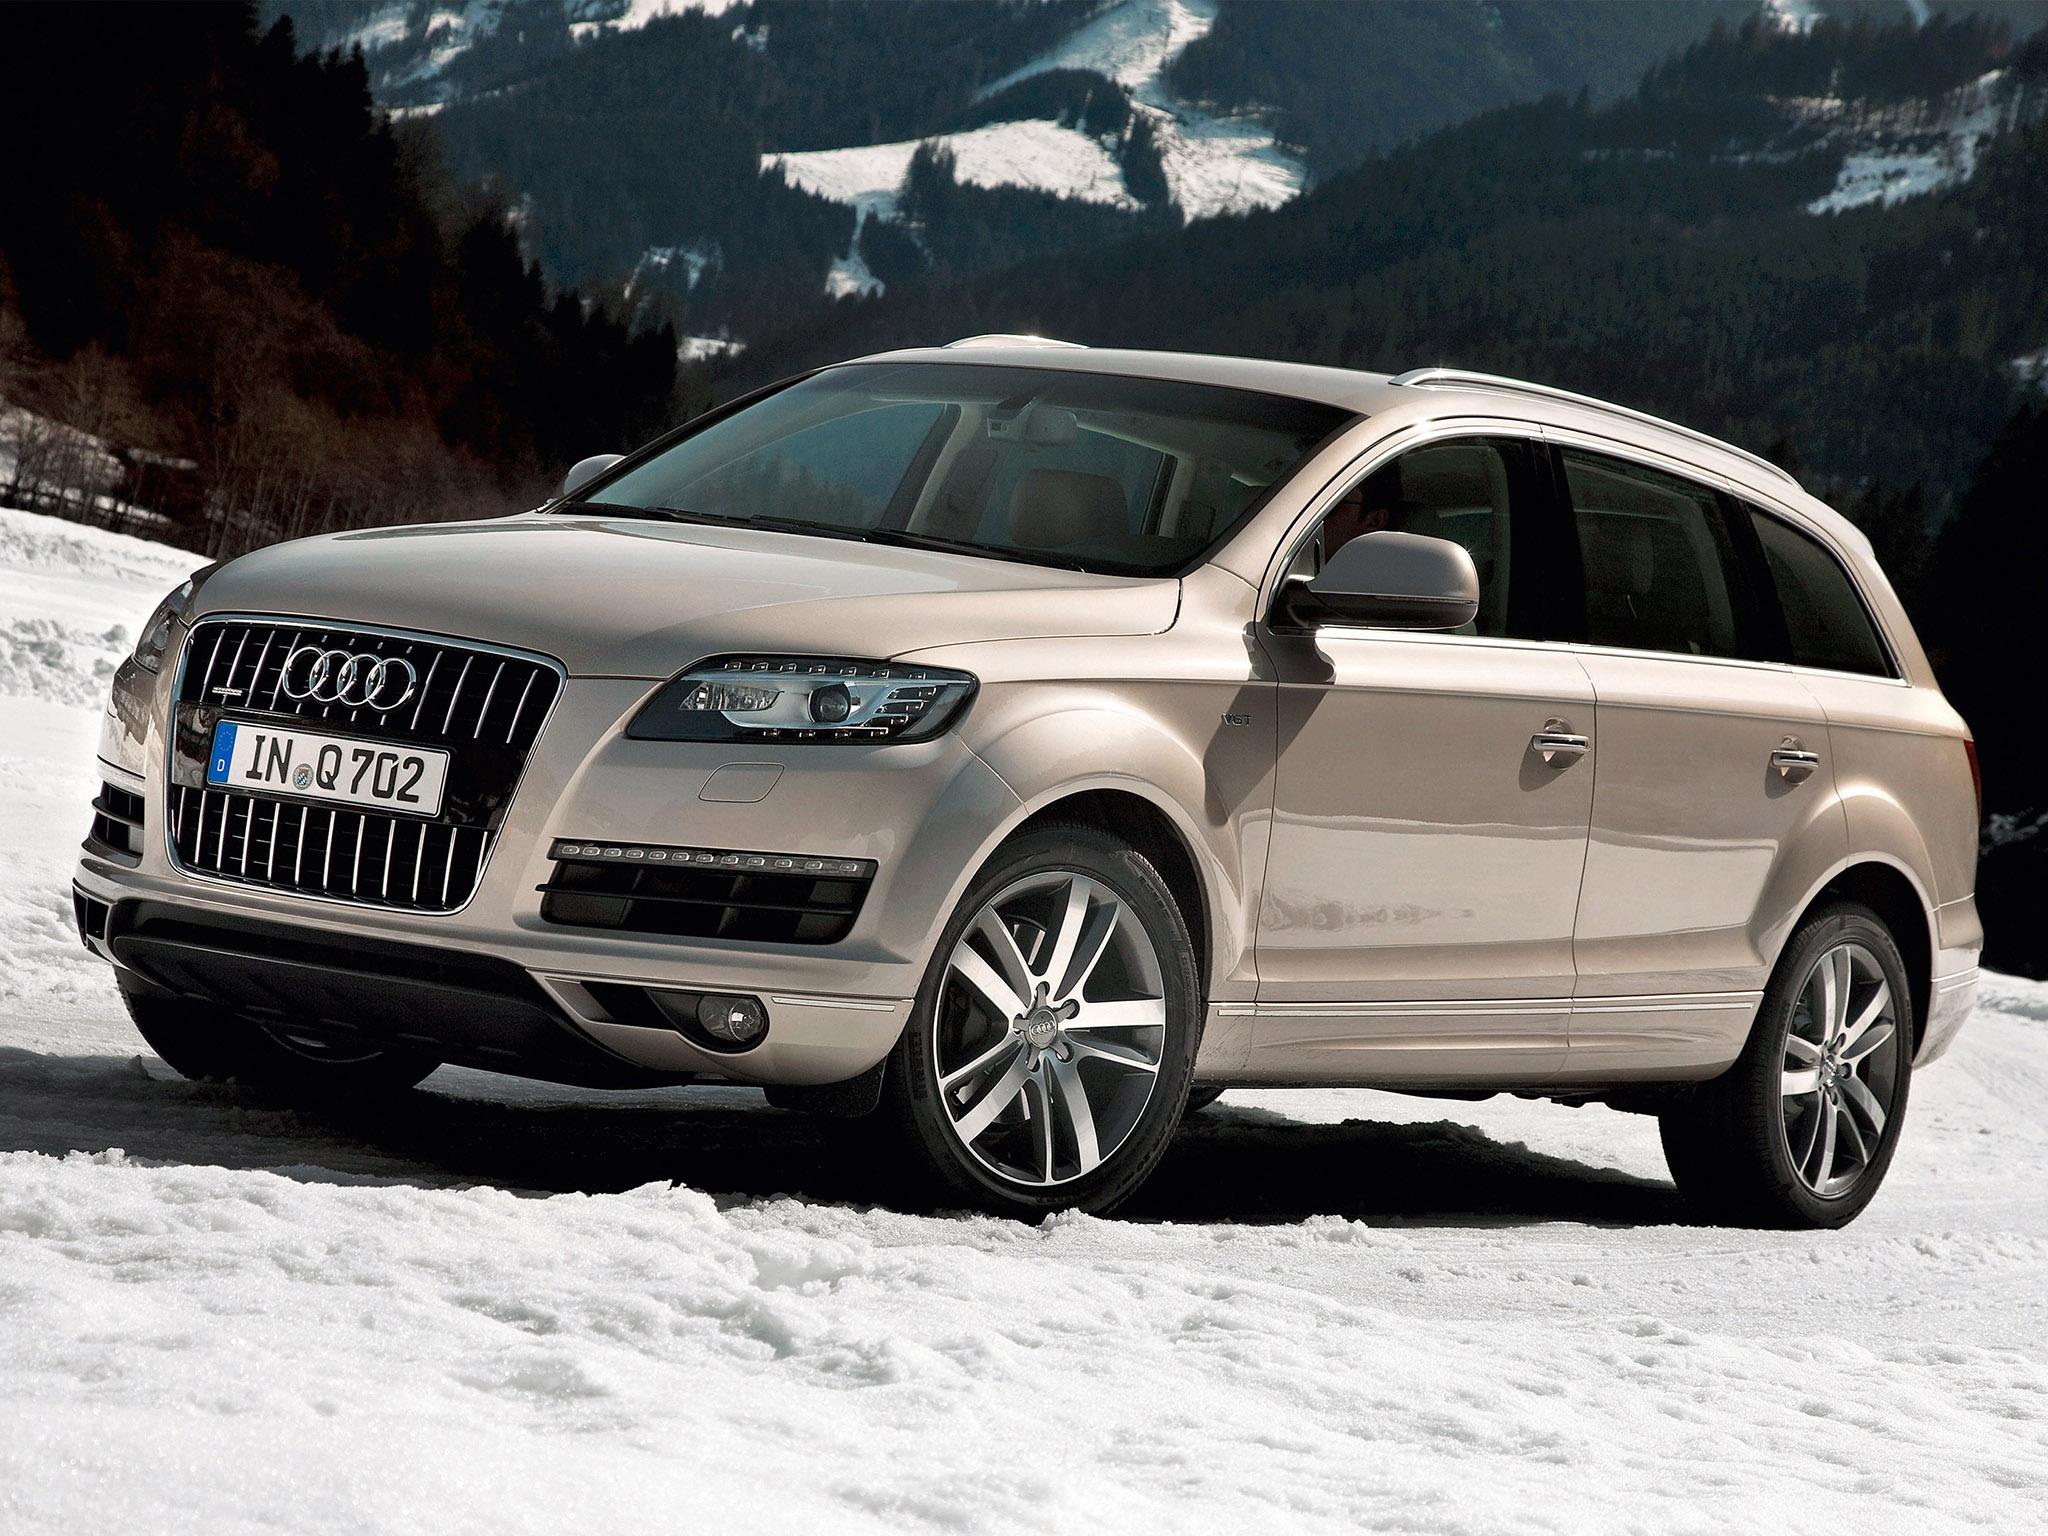 Audi q7 3.0t